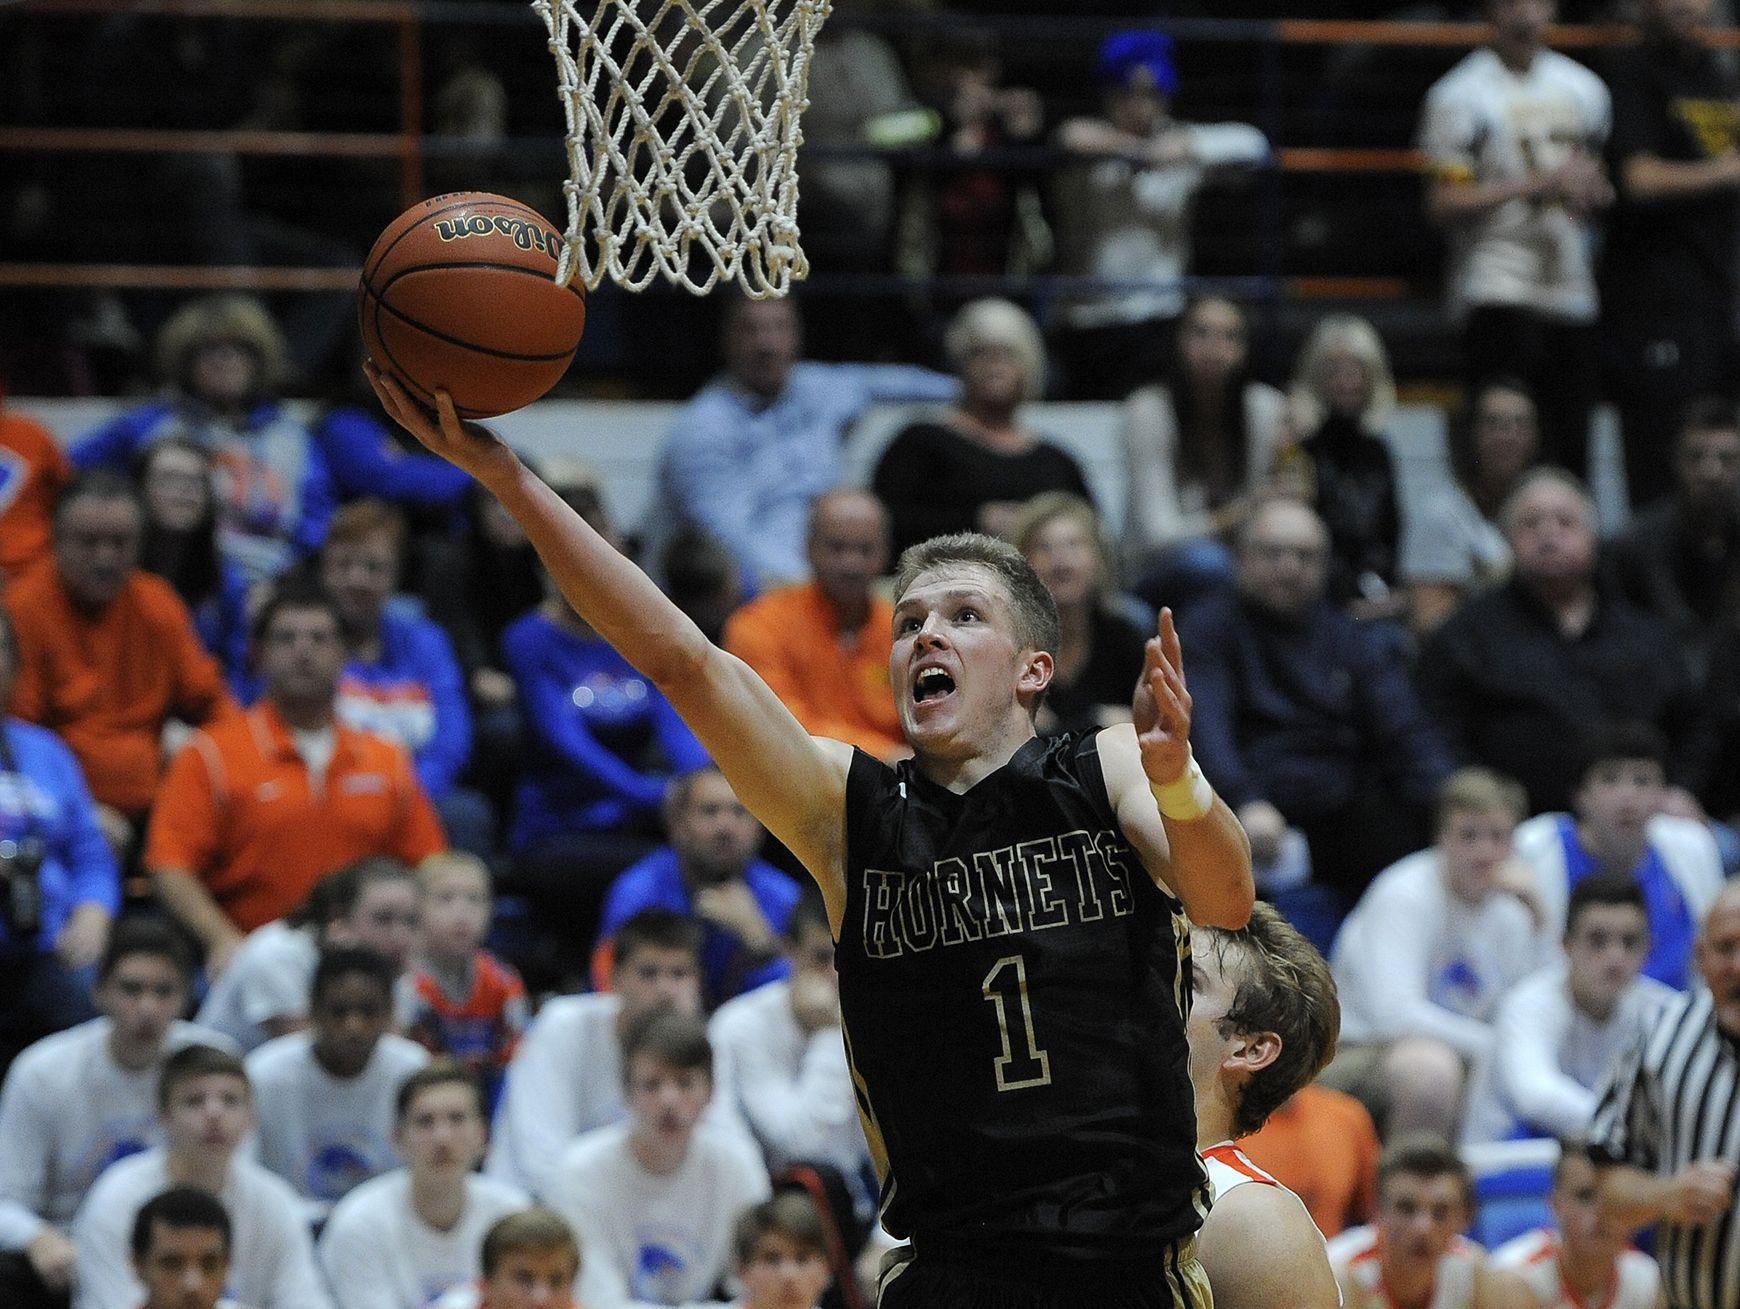 Henryville's Braxton Robertson shoots against Silver Creek?s Jacob Garrett on Nov. 22 at Silver Creek High School